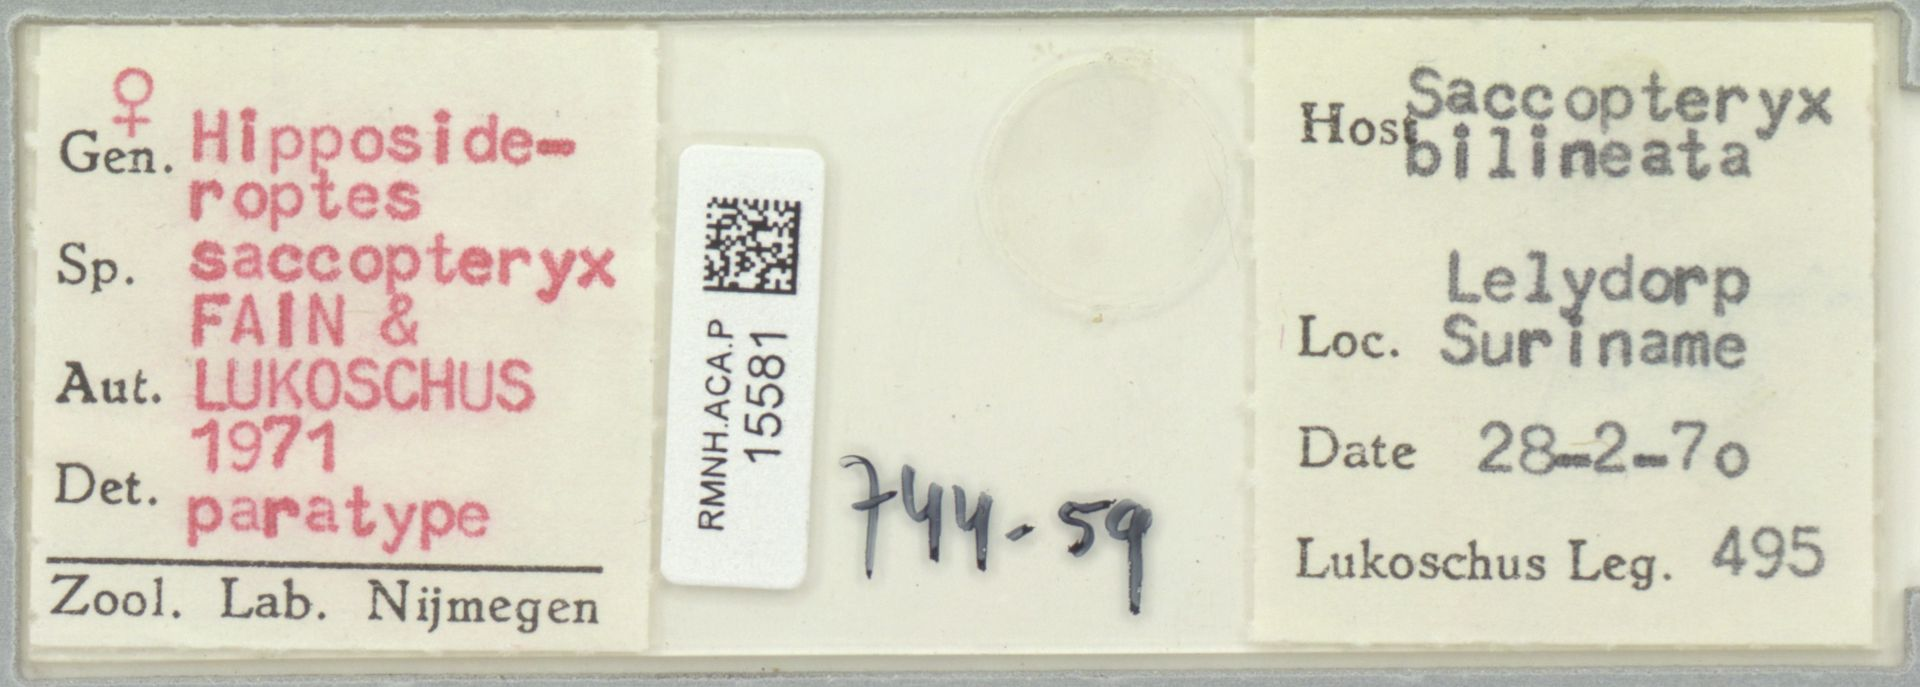 RMNH.ACA.P.15581 | Hipposideroptes saccopteryx